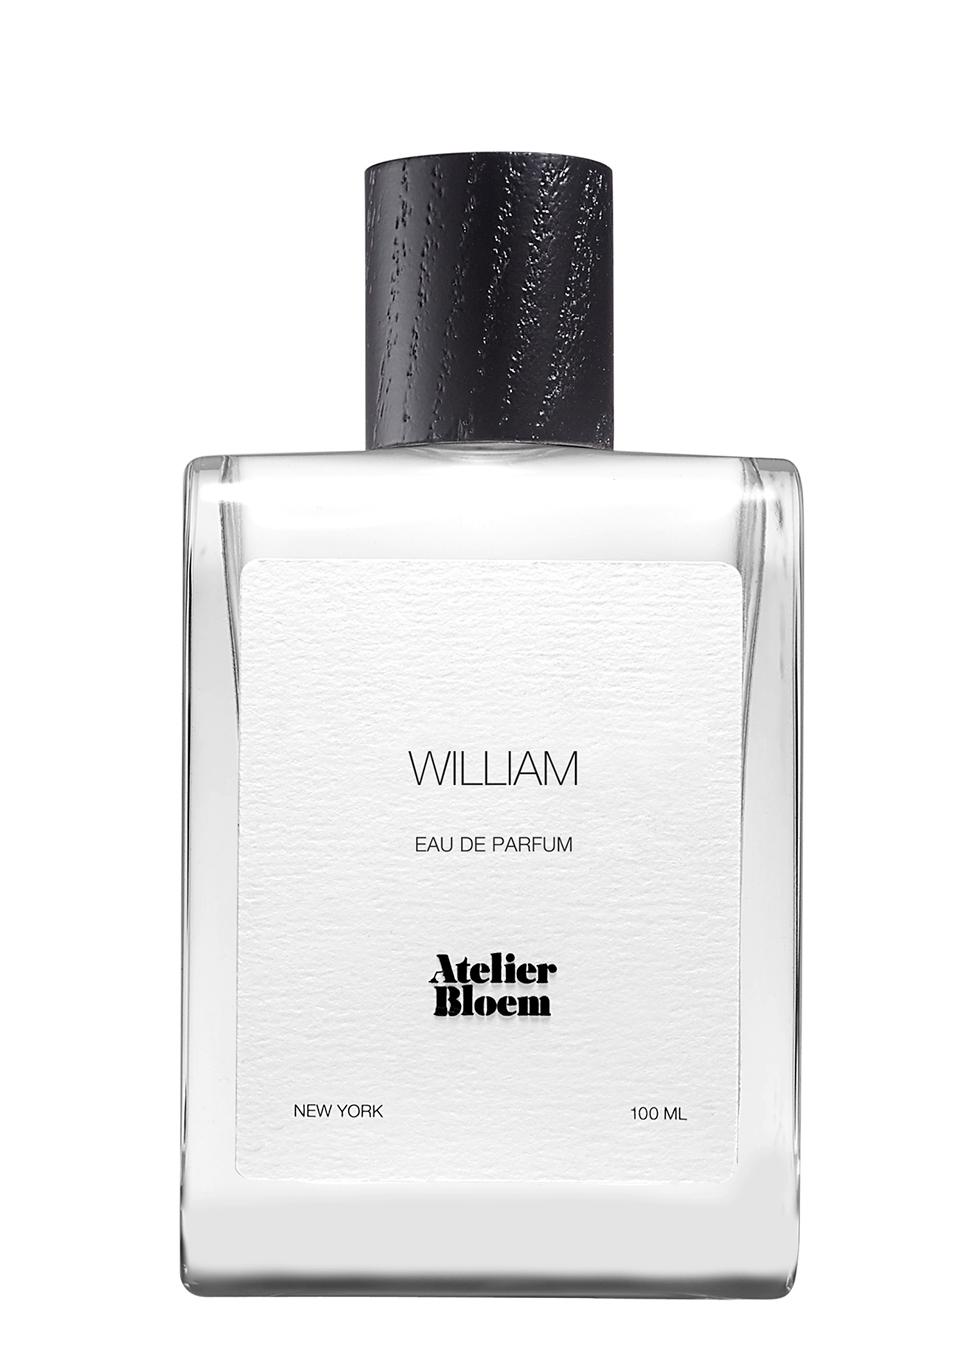 William Eau De Parfum 100ml - ATELIER BLOEM